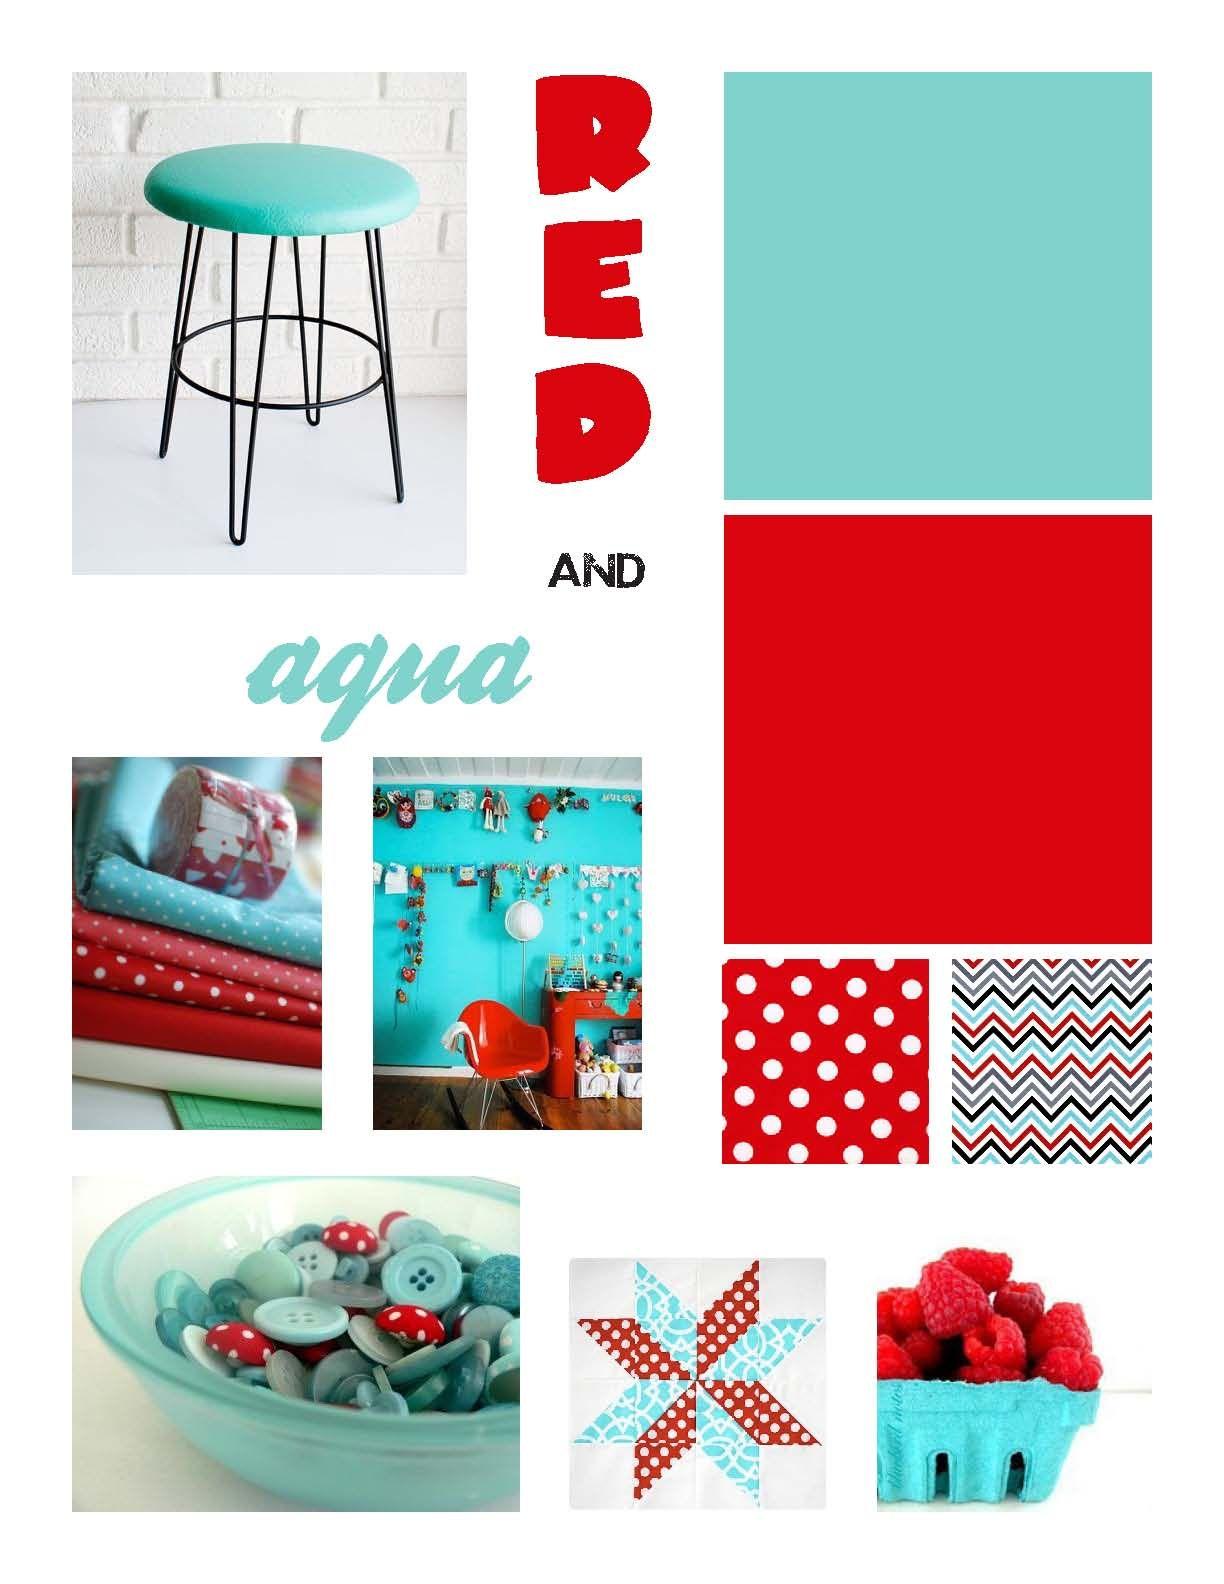 red and aqua | scamp ideas | Pinterest | Aqua, Bed storage and ...